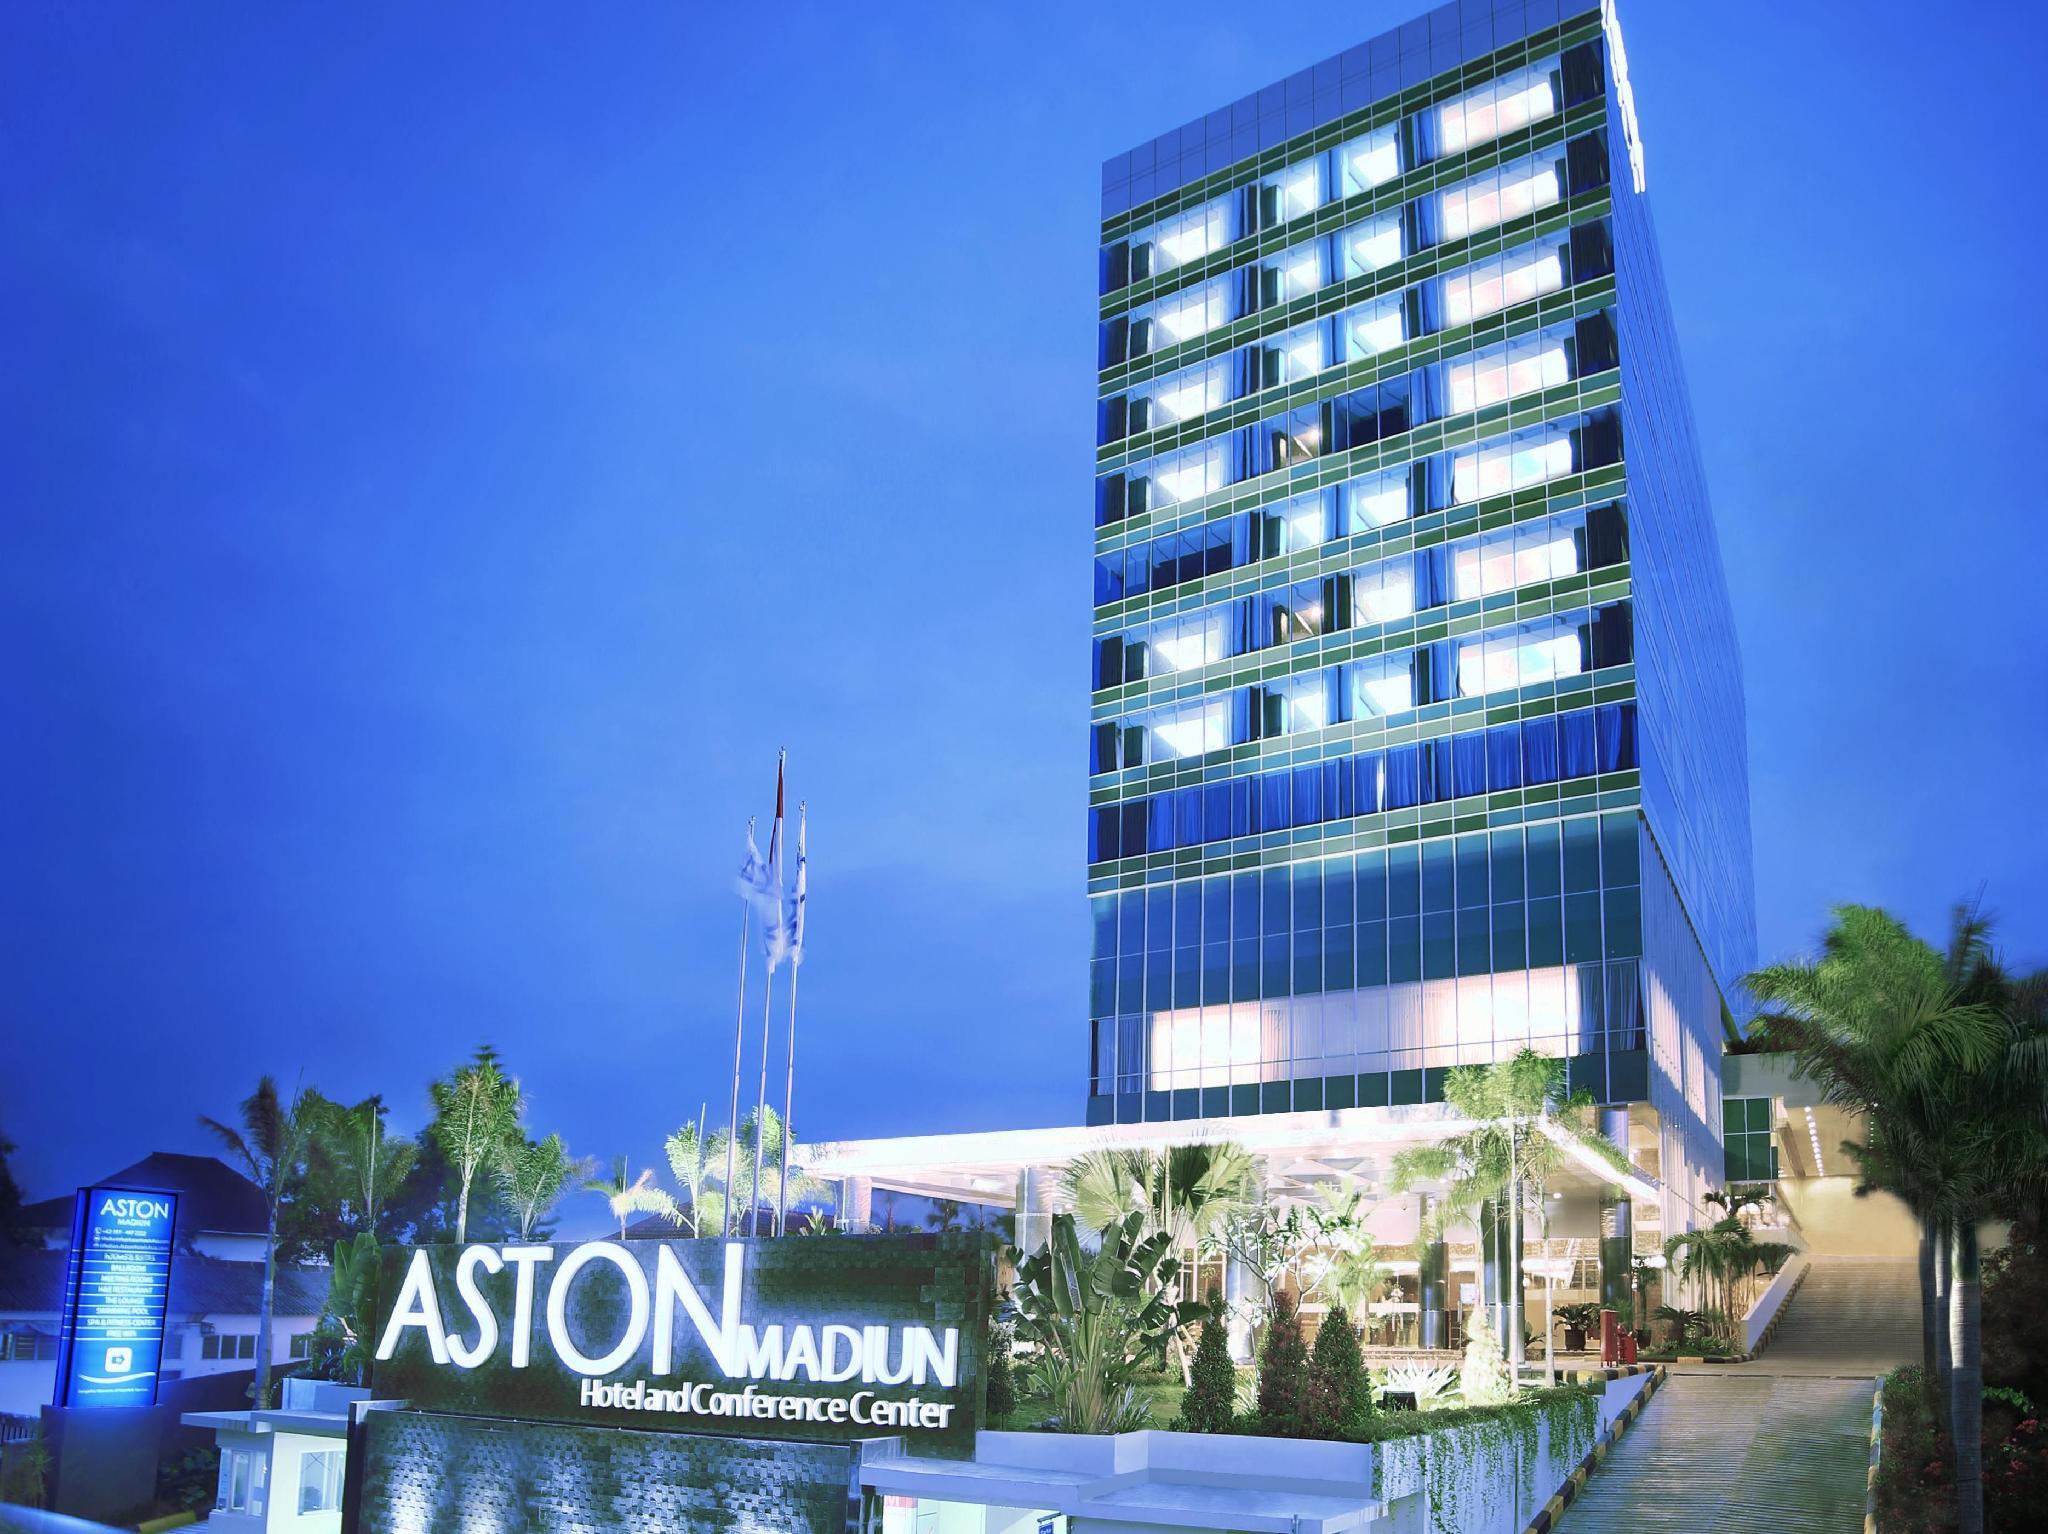 aston madiun hotel and conference center in indonesia room deals rh agoda com alamat hotel di madiun jawa timur penginapan di madiun jawa timur